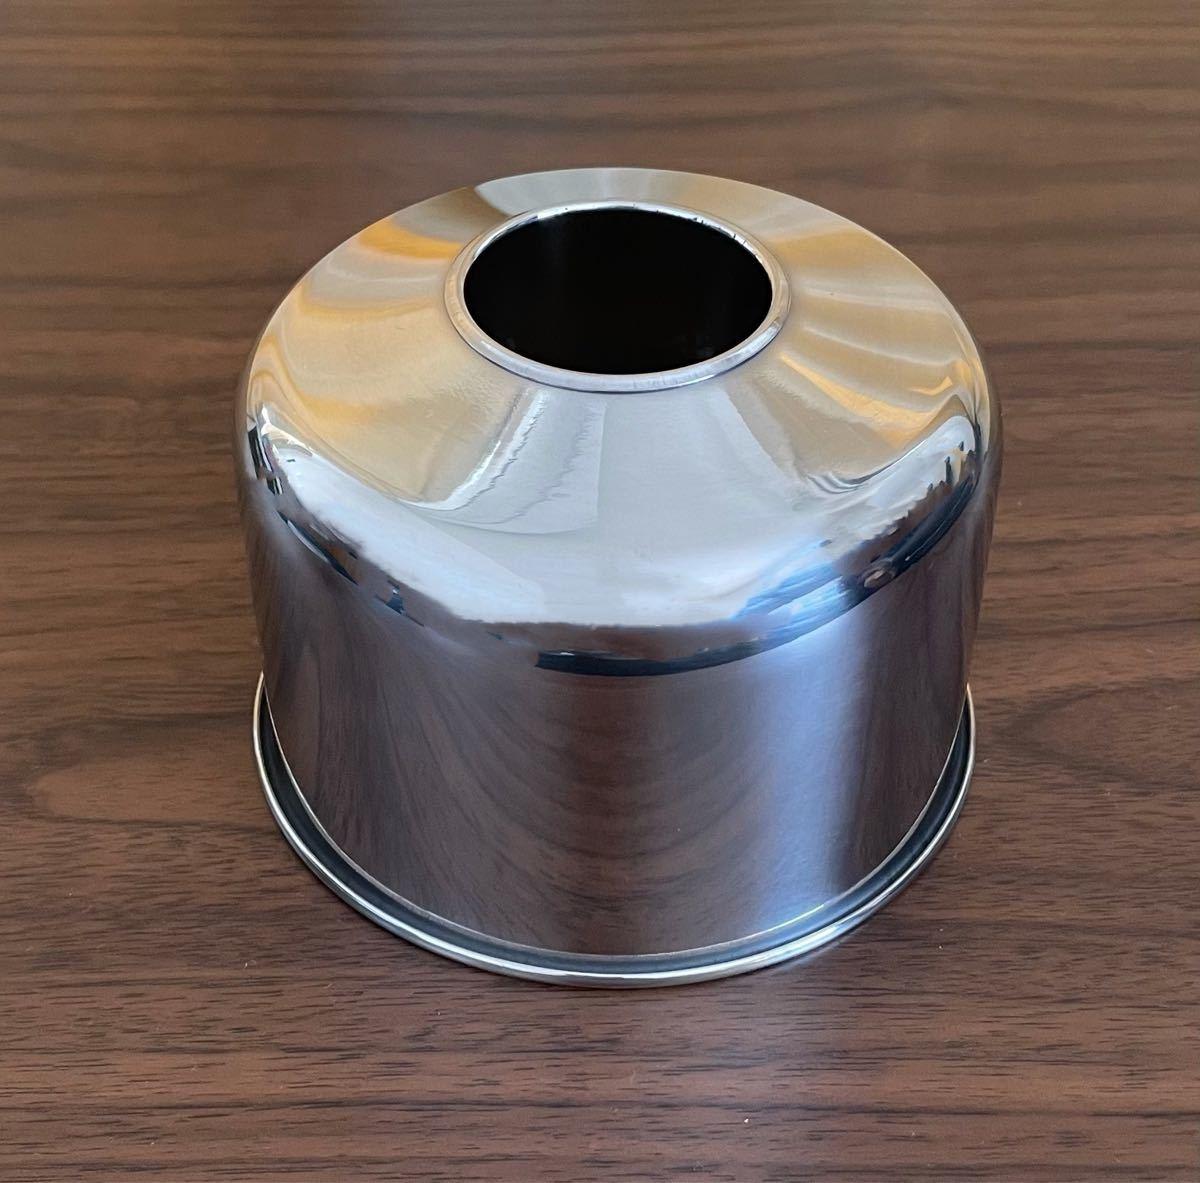 OD缶カバー 金属カバー 鏡面仕上げ 色シルバー 250用ランタン ガス缶カバー